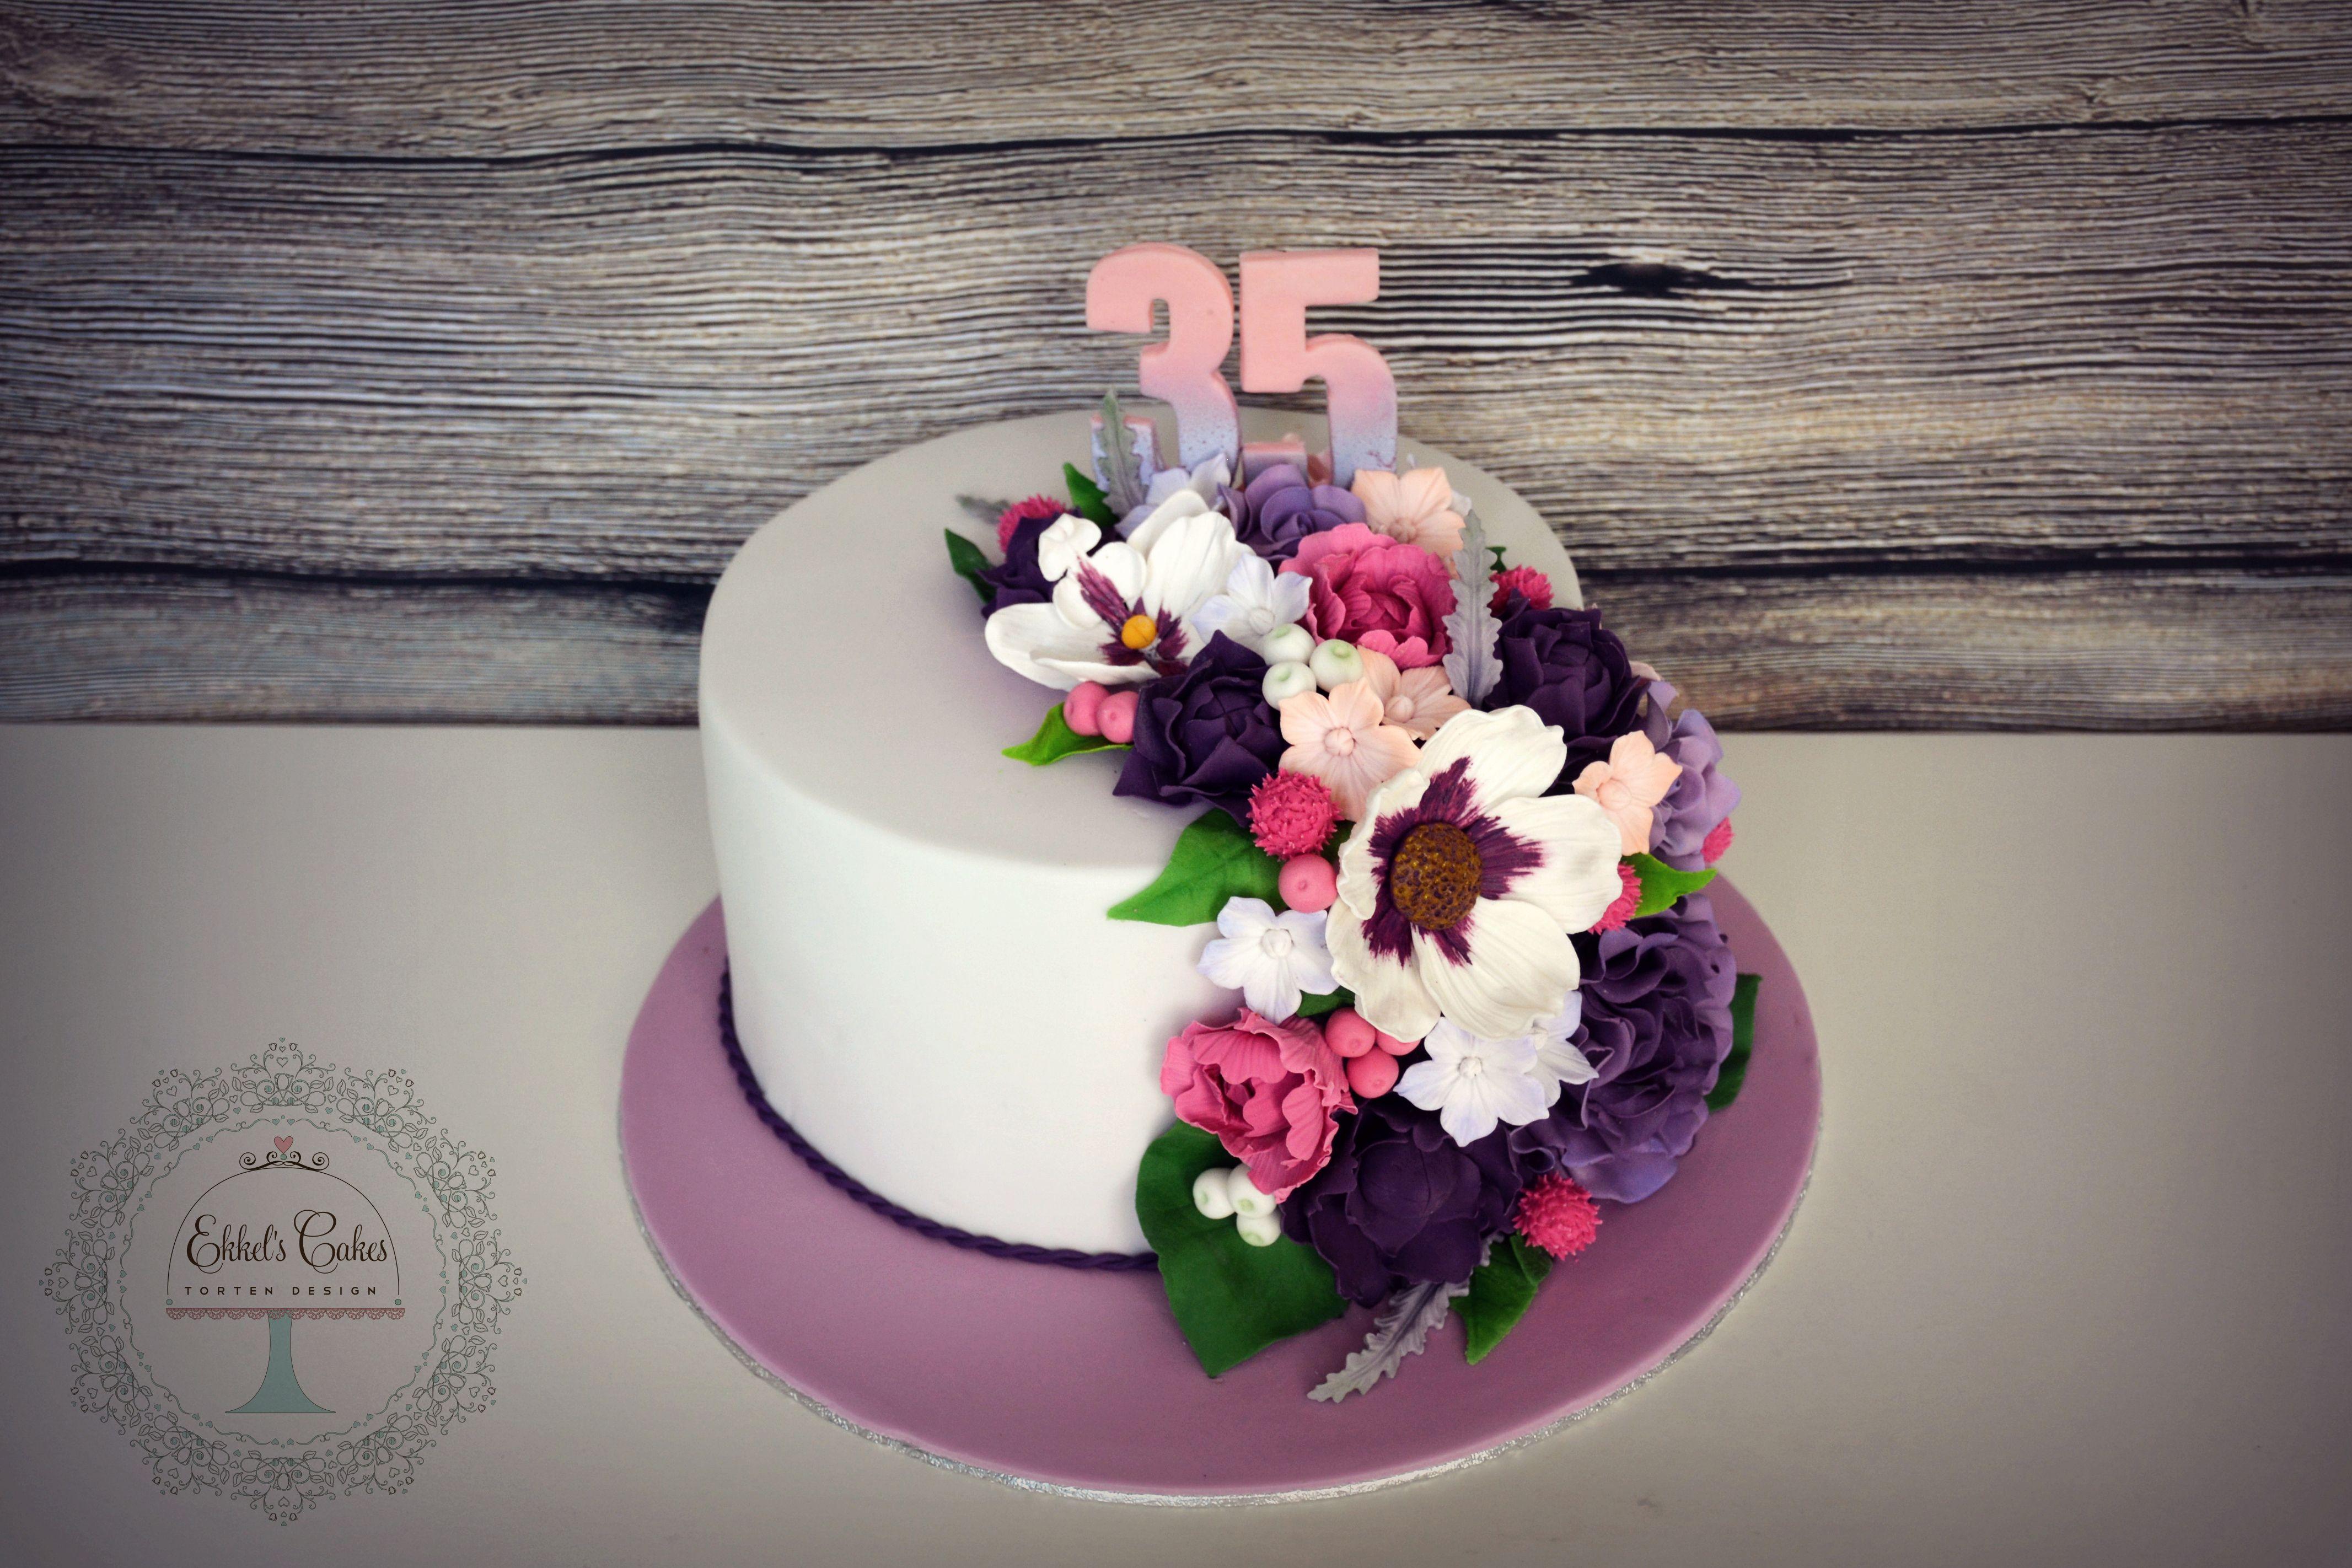 35thbirthday Geburtstag Birthday Woman Flower Blume Rose